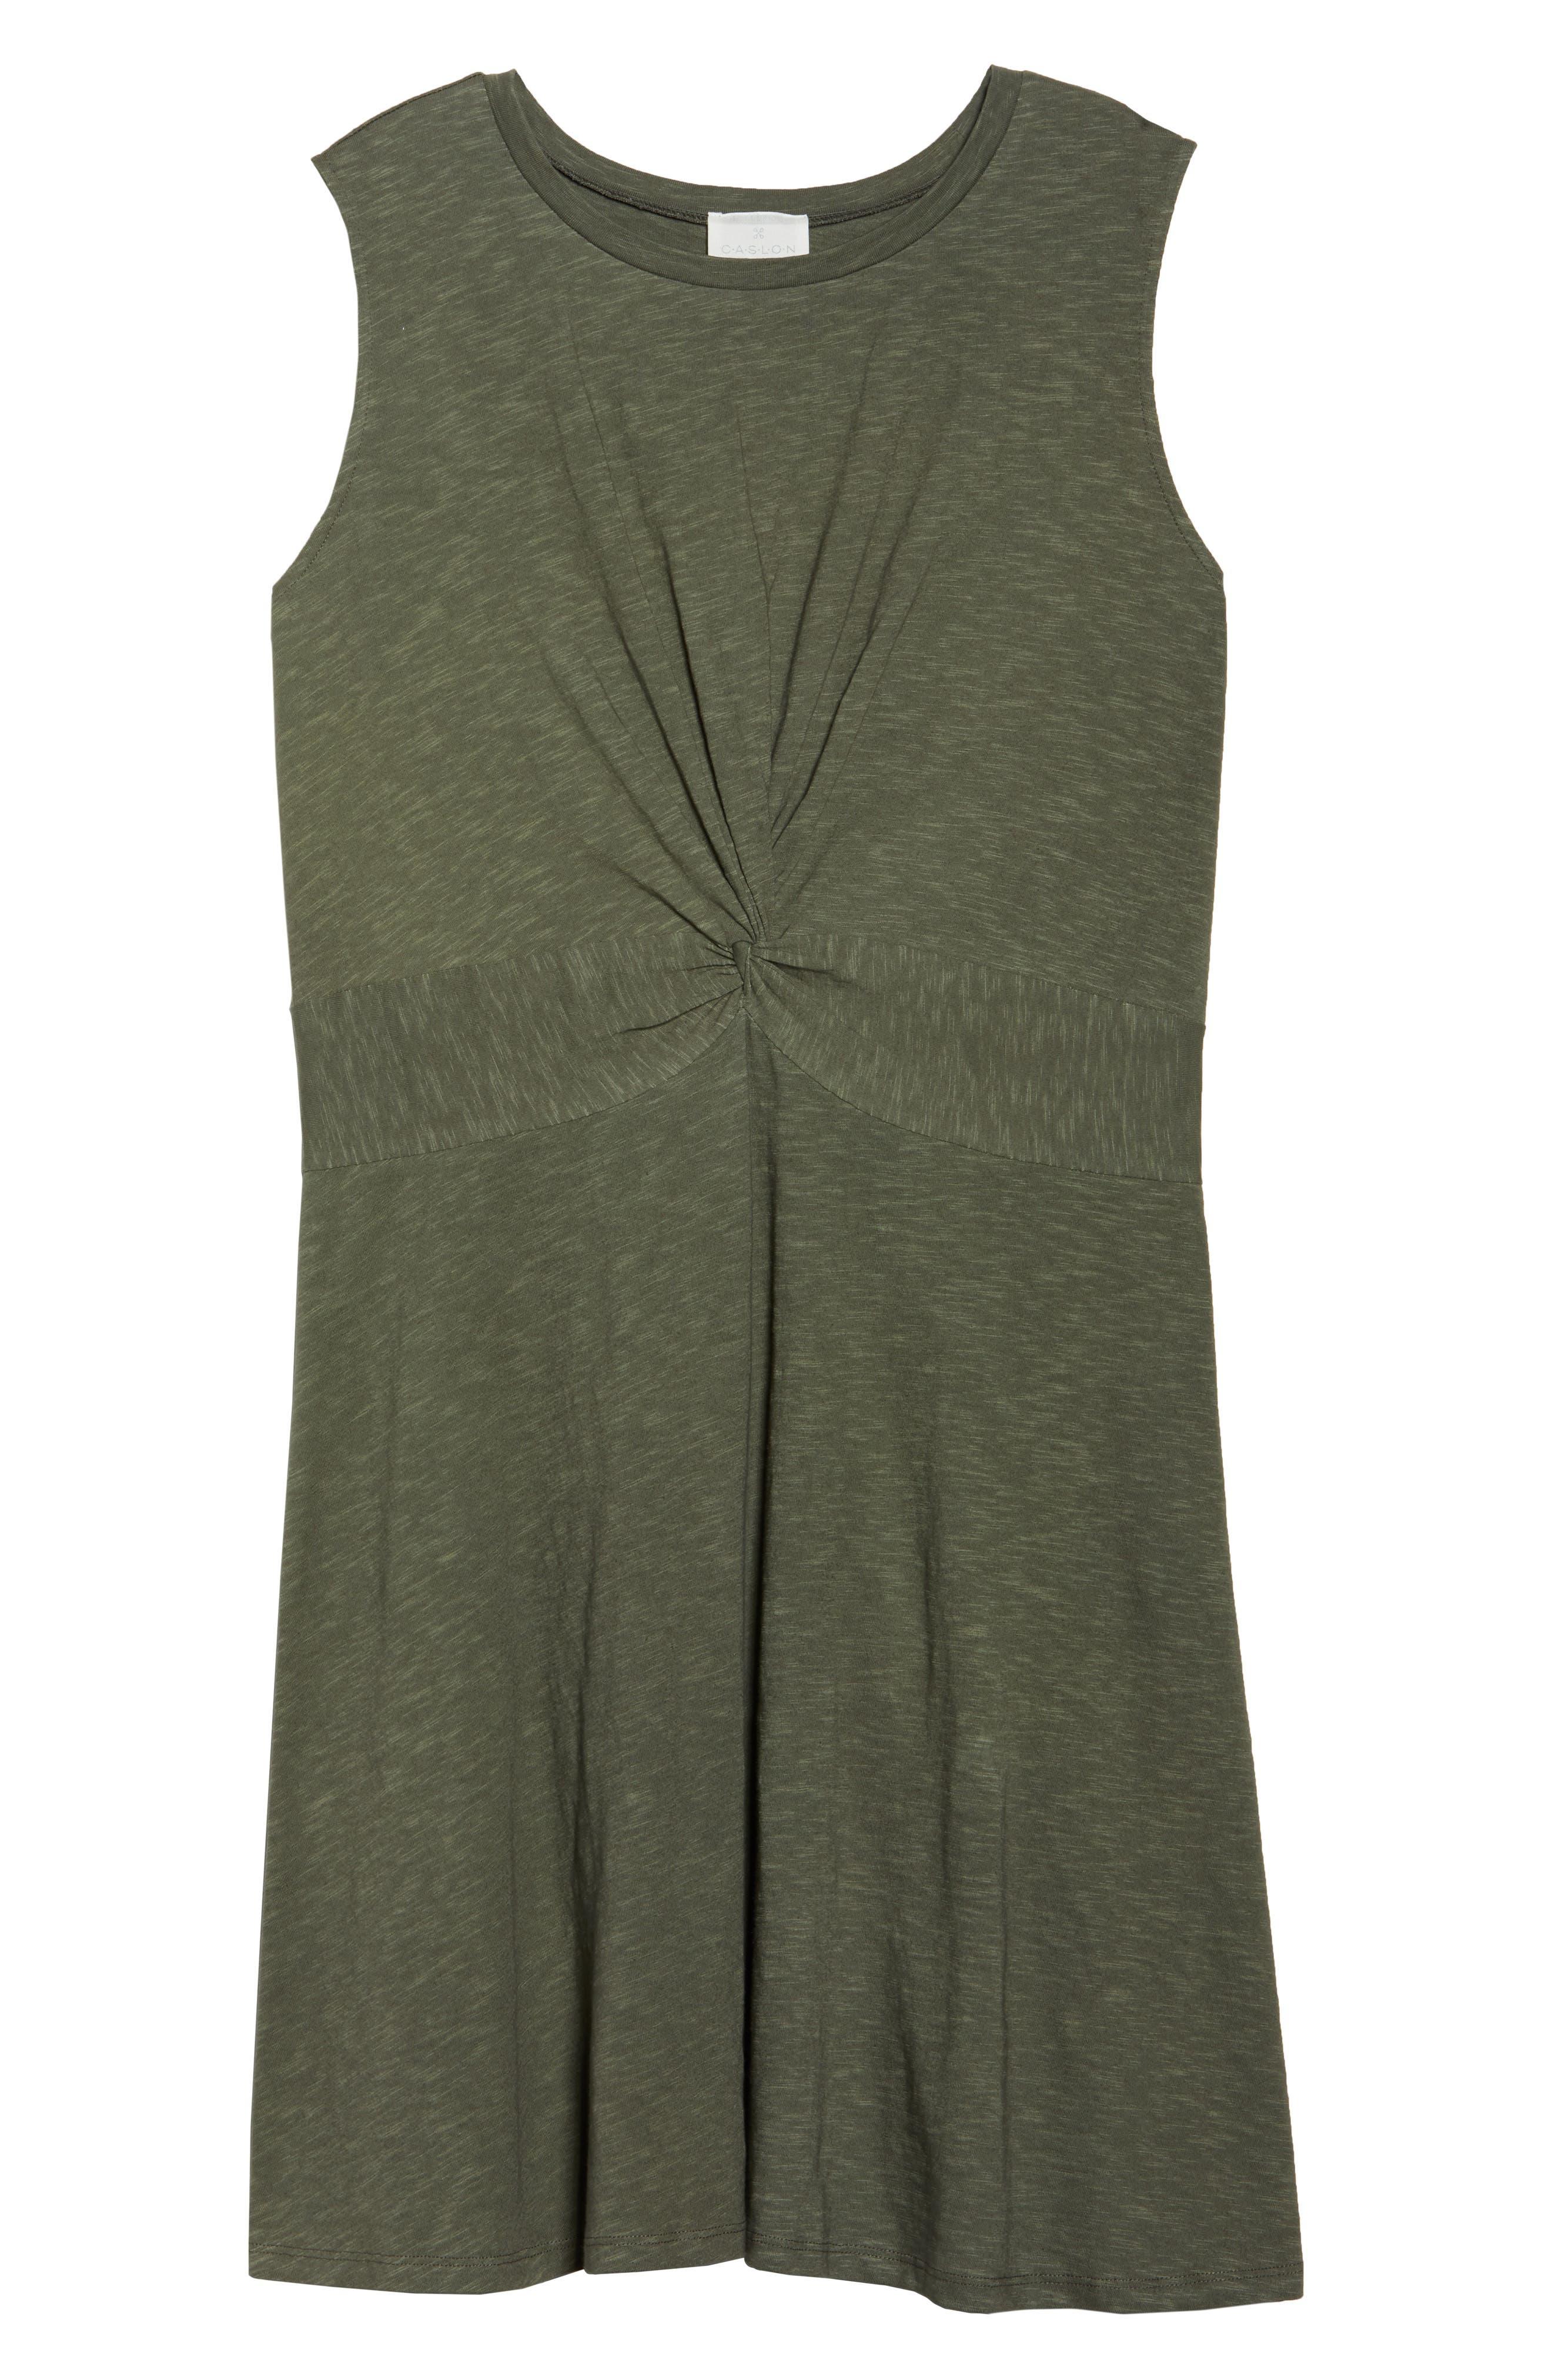 Twist Front Knit Dress,                             Alternate thumbnail 6, color,                             OLIVE SARMA